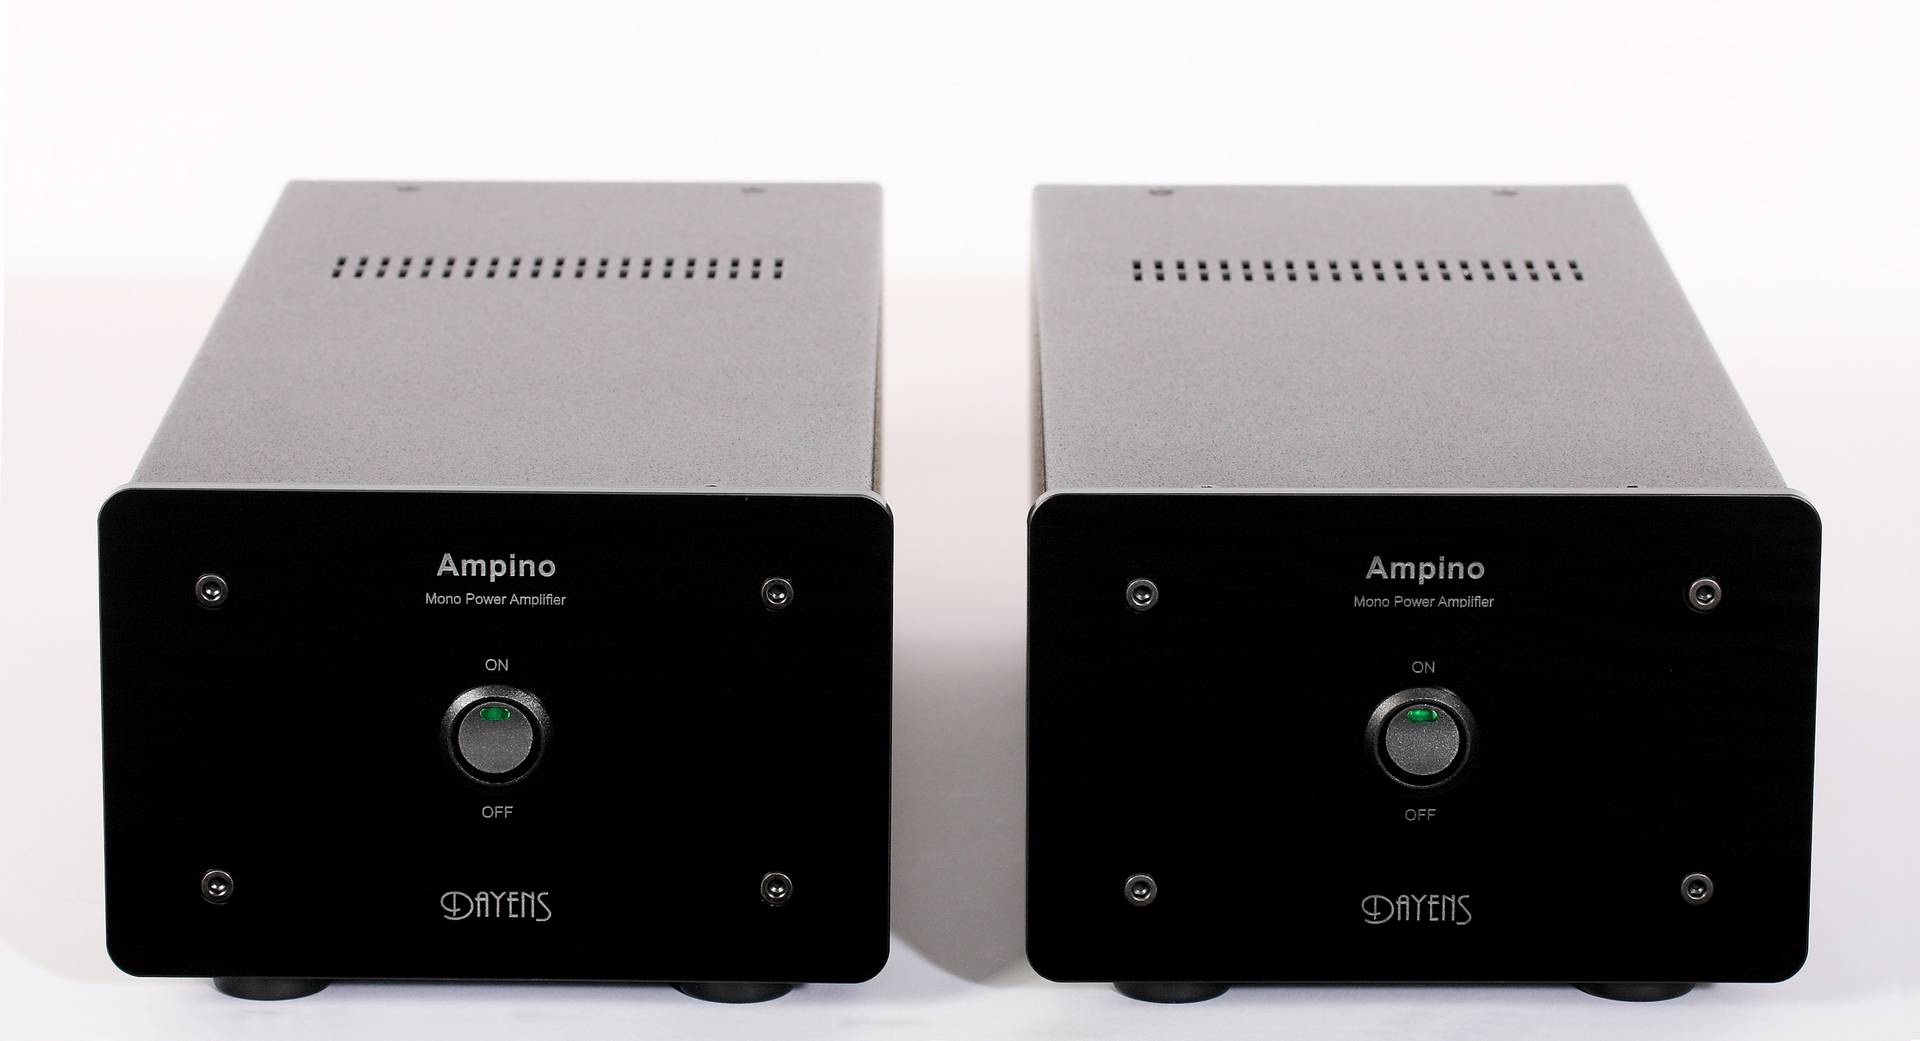 Dayens Ampino Mono Power Amplificator De Putere High Quality Monoblock Amplifier